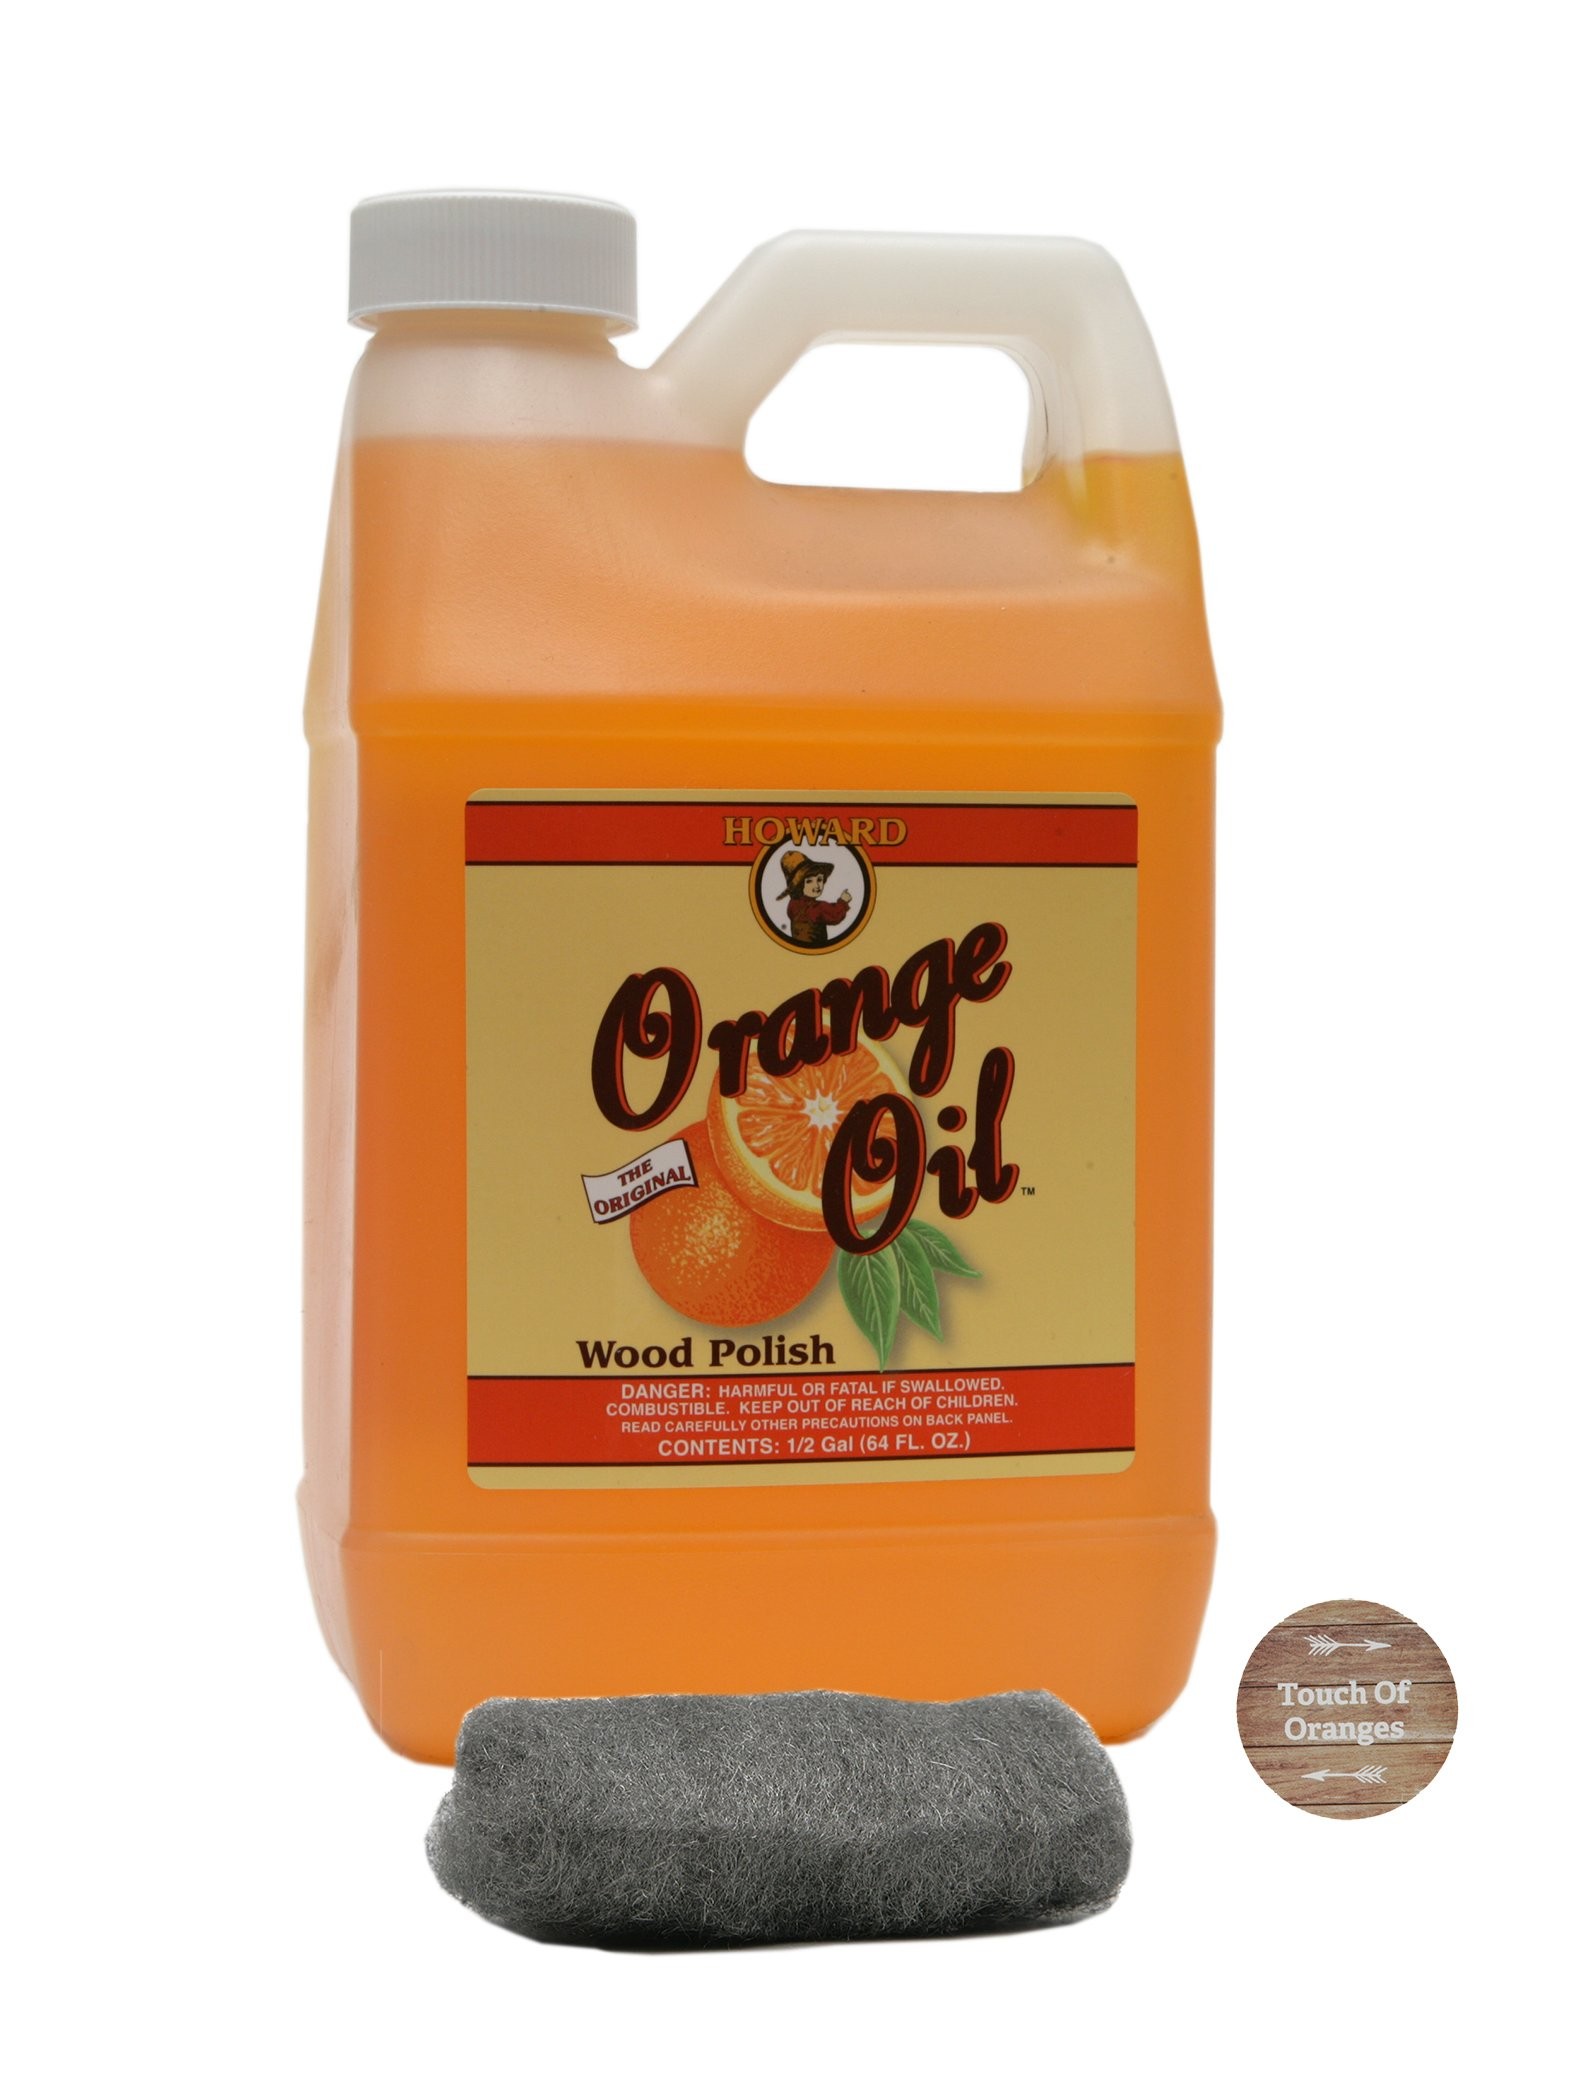 Howard Orange Oil 64 oz Half Gallon, Clean Kitchen Cabinets, Polish and Shine Wood Furniture, Orange Wood Cleaner by Howard Products